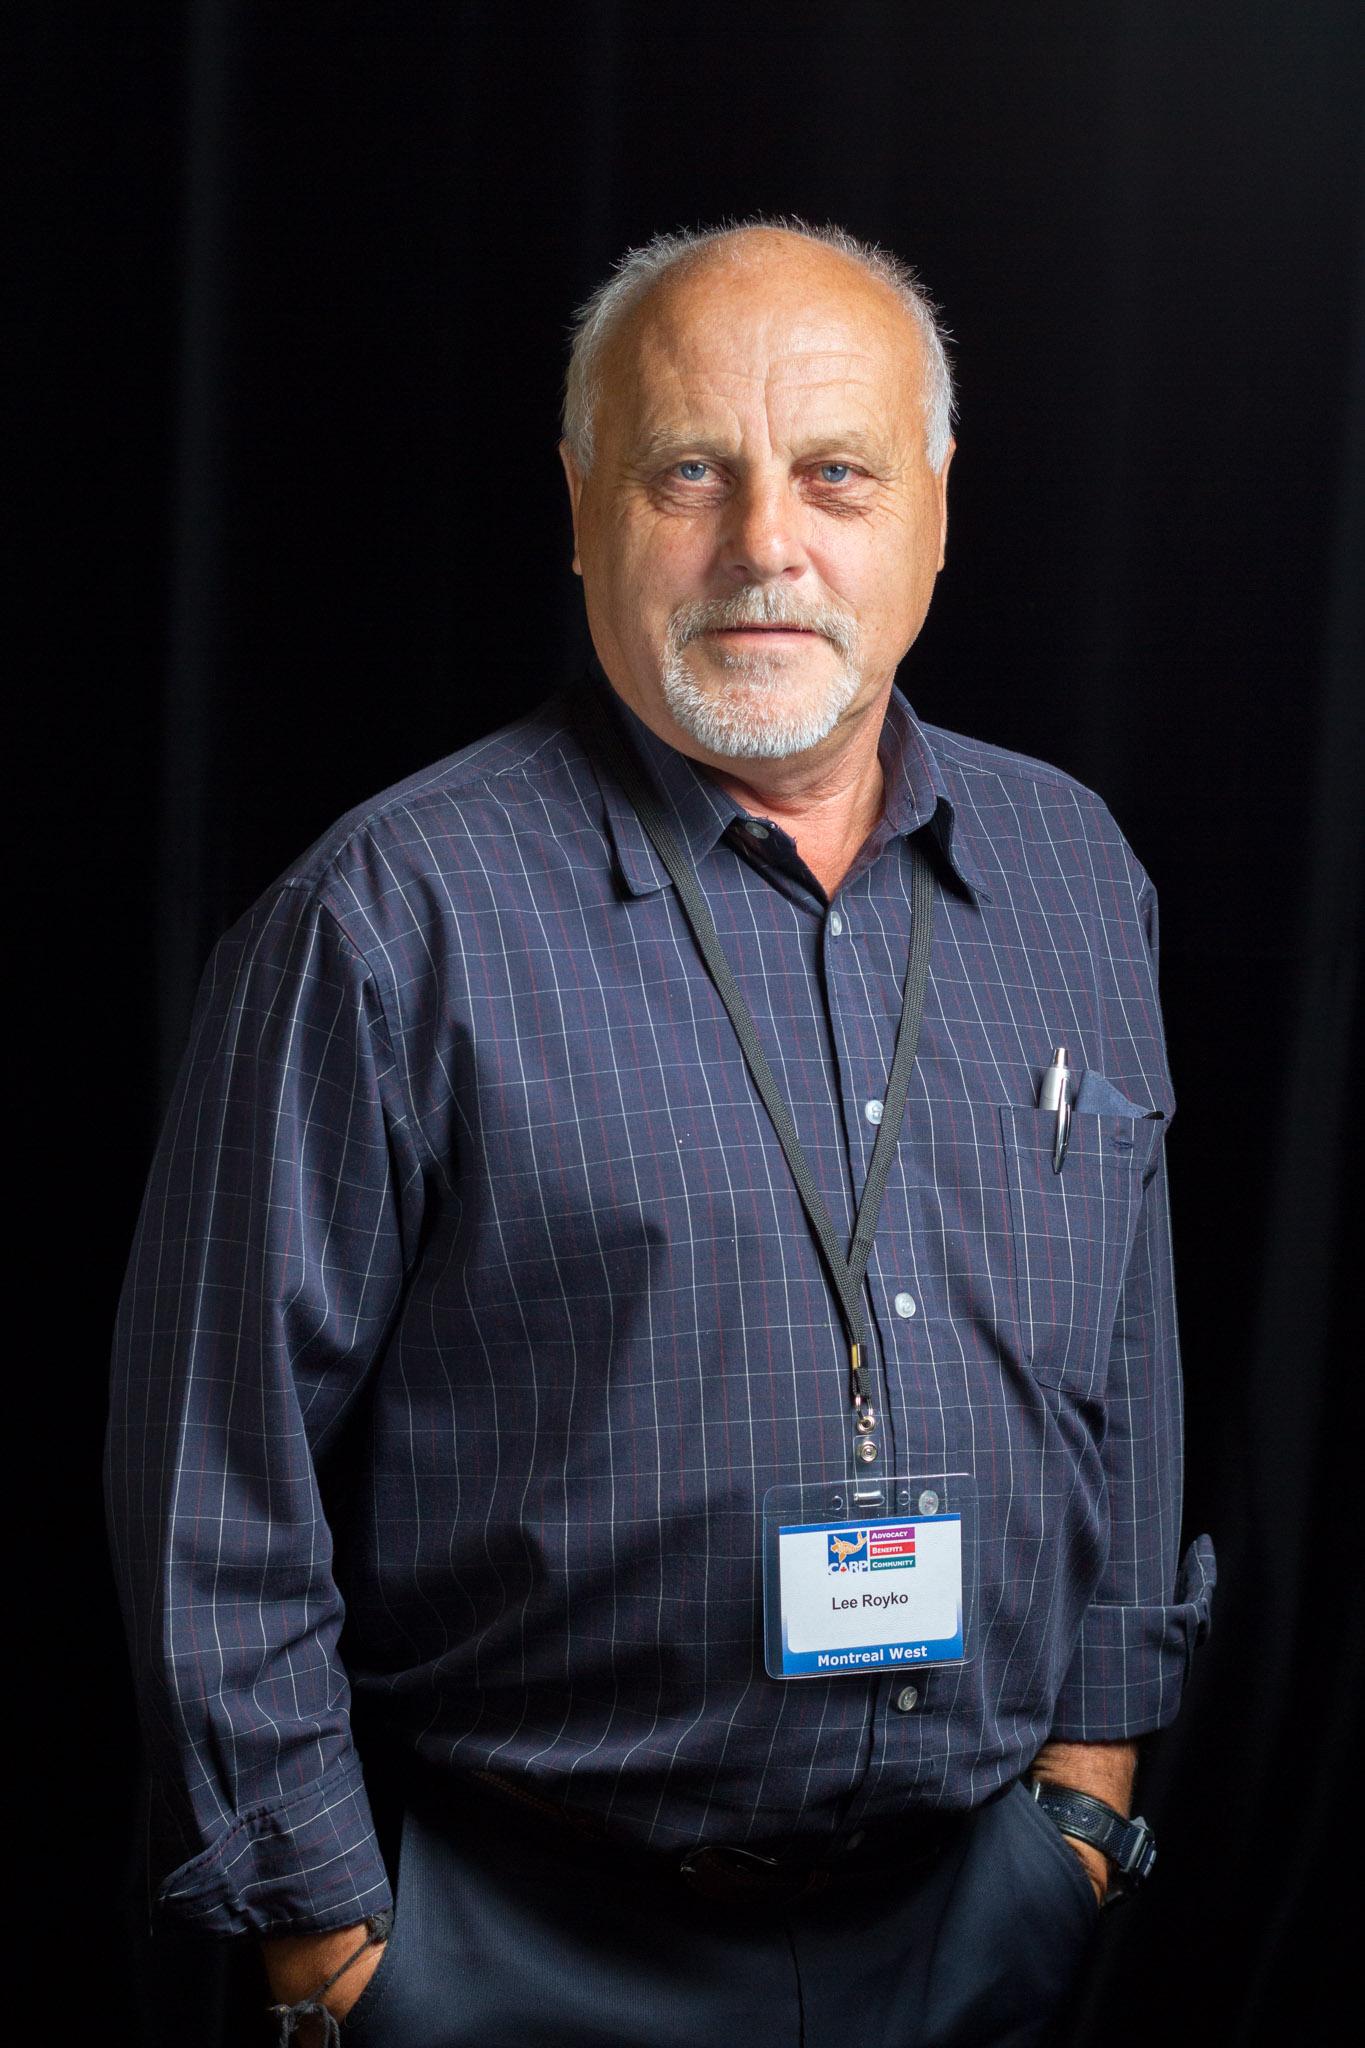 Lee Royko